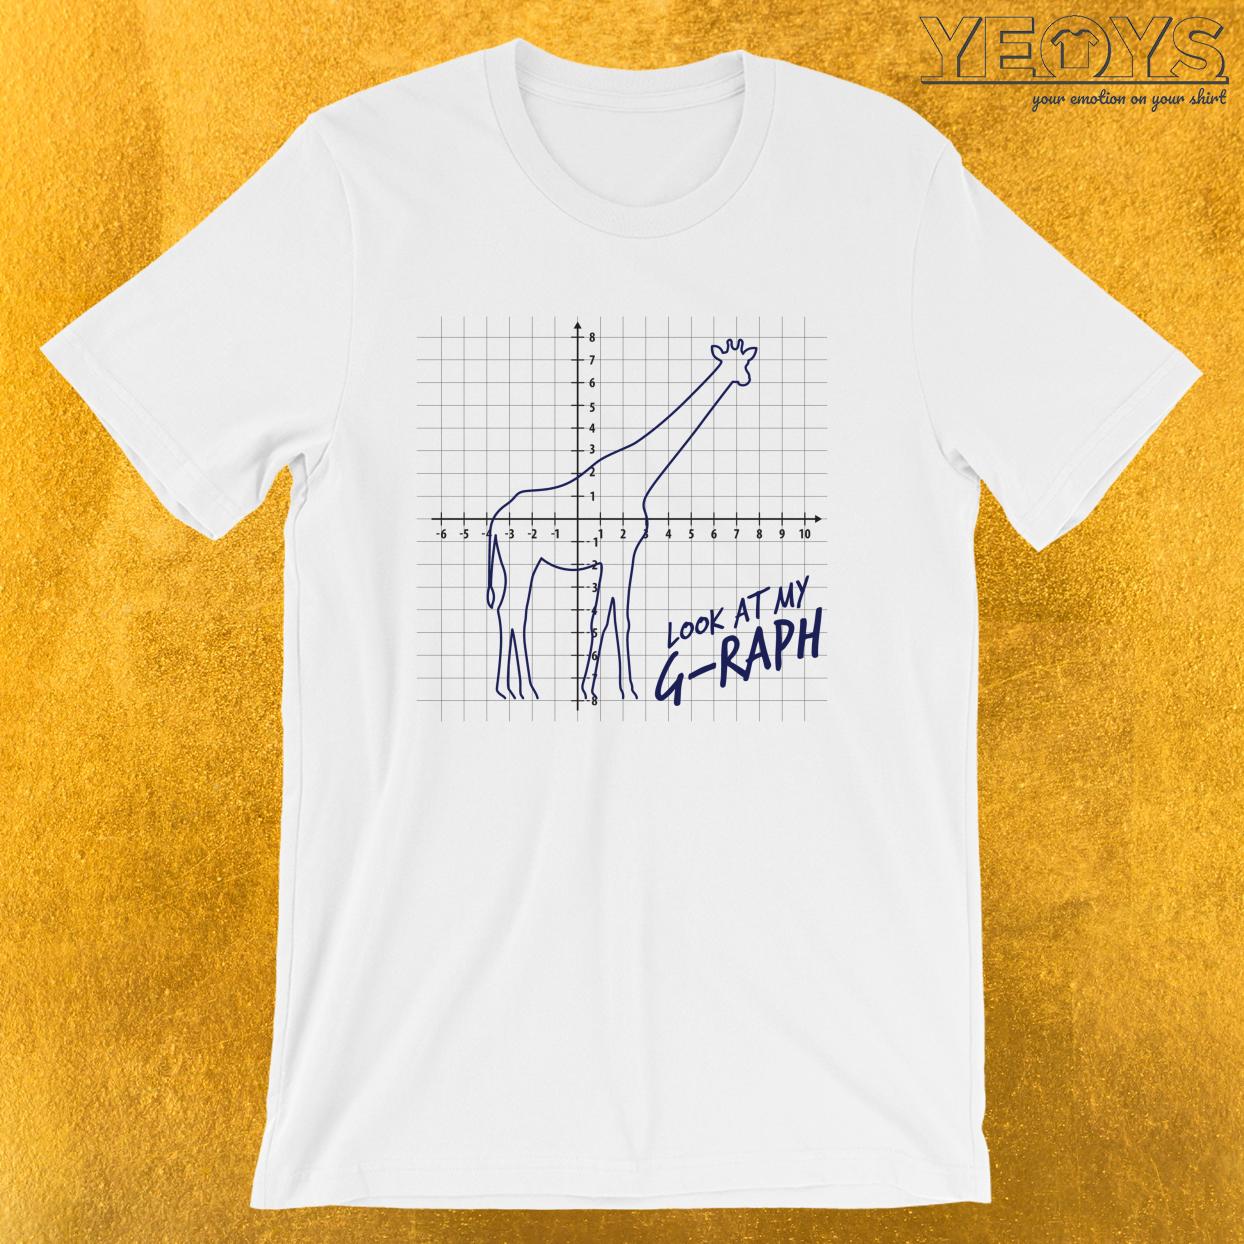 Look At My Graph – Giraffe Pun Tee